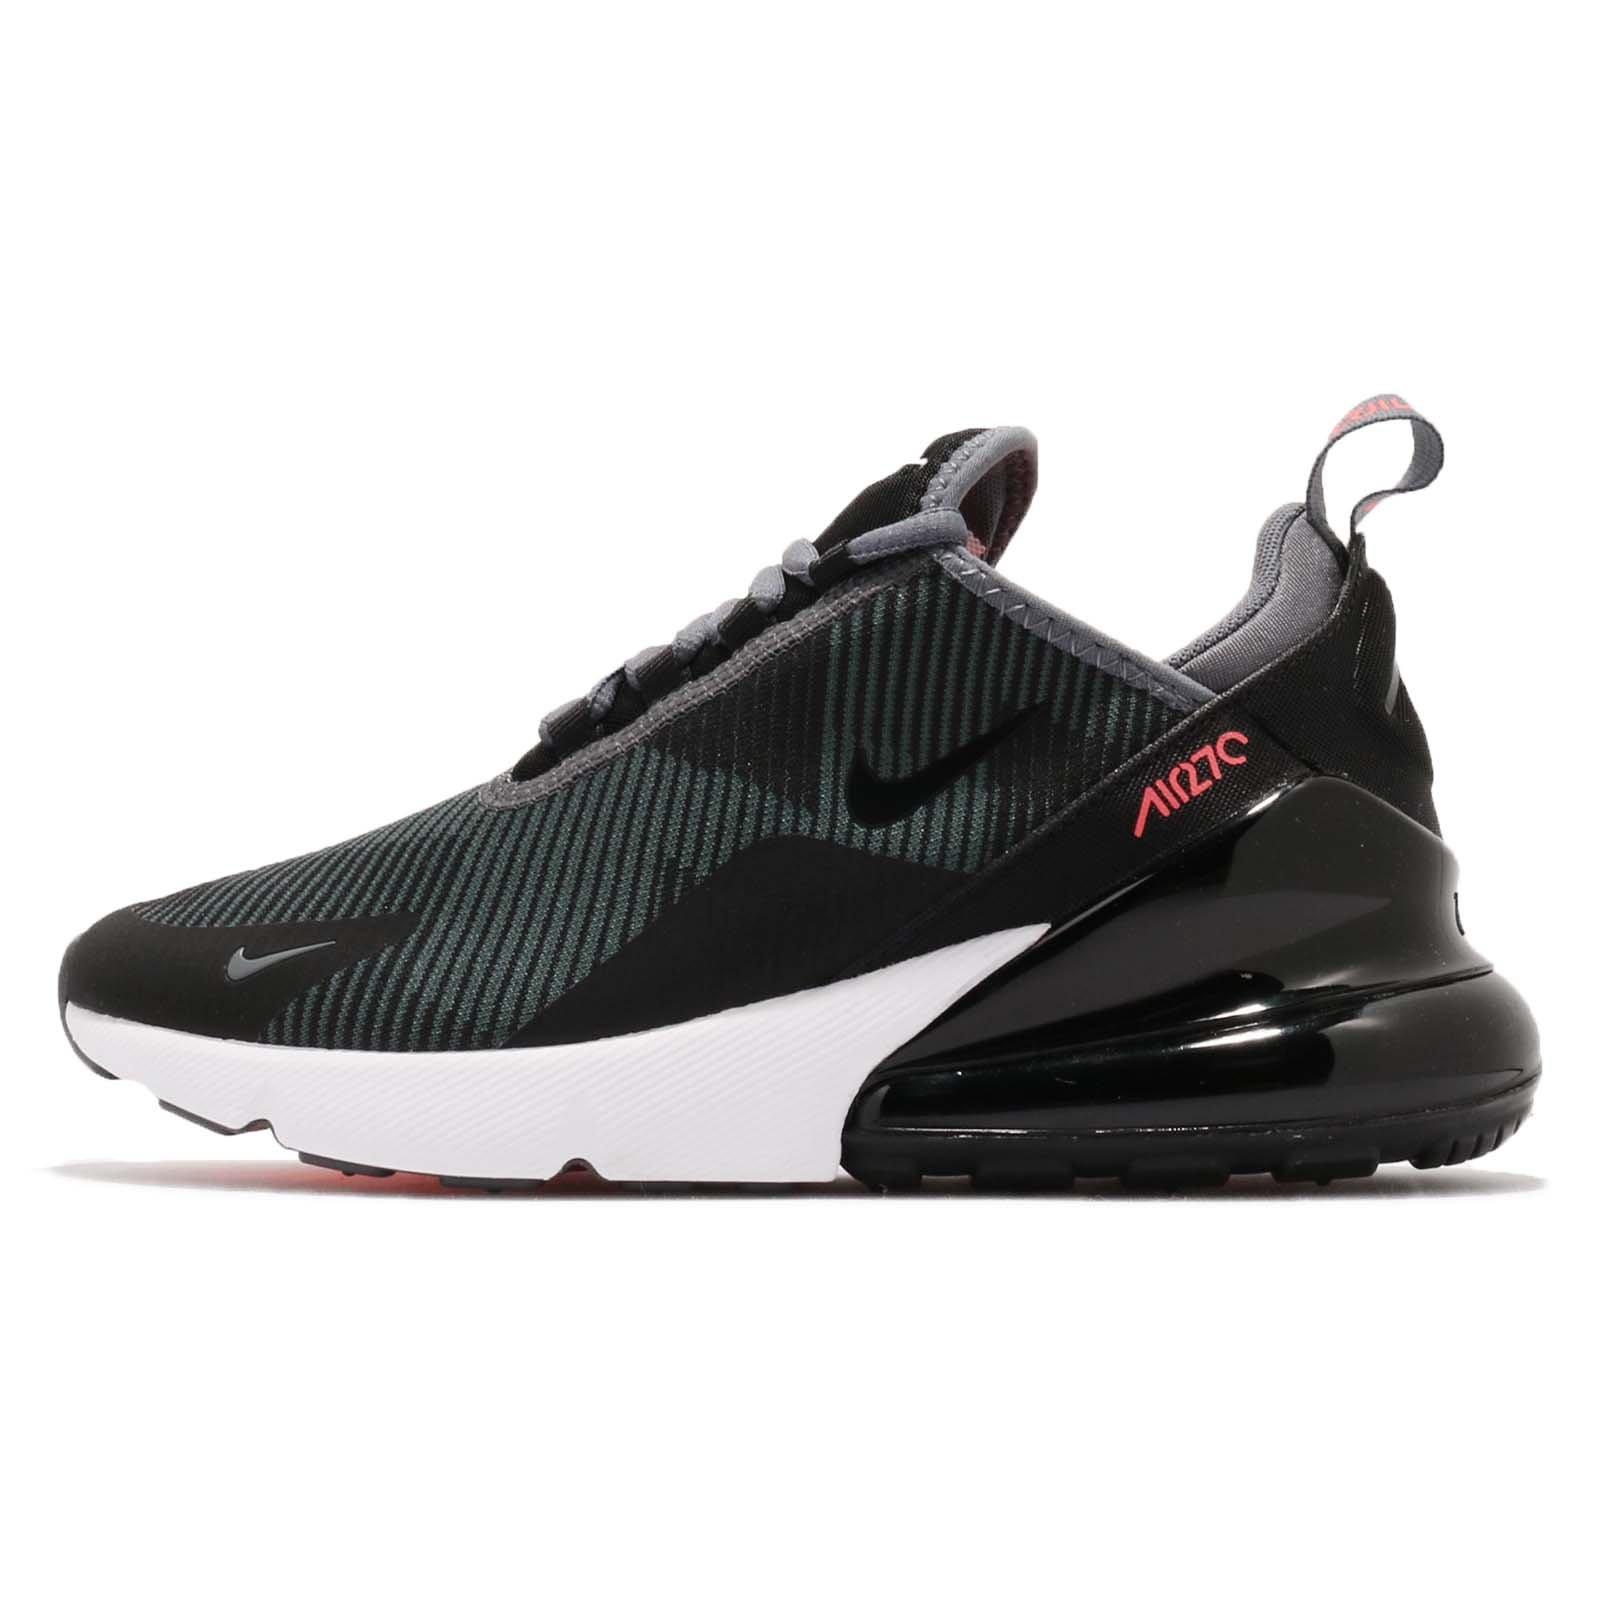 Nike Kid's Air Max 270 KJCRD GS, Dark Grey/Black-HOT Punch, Youth Size 4